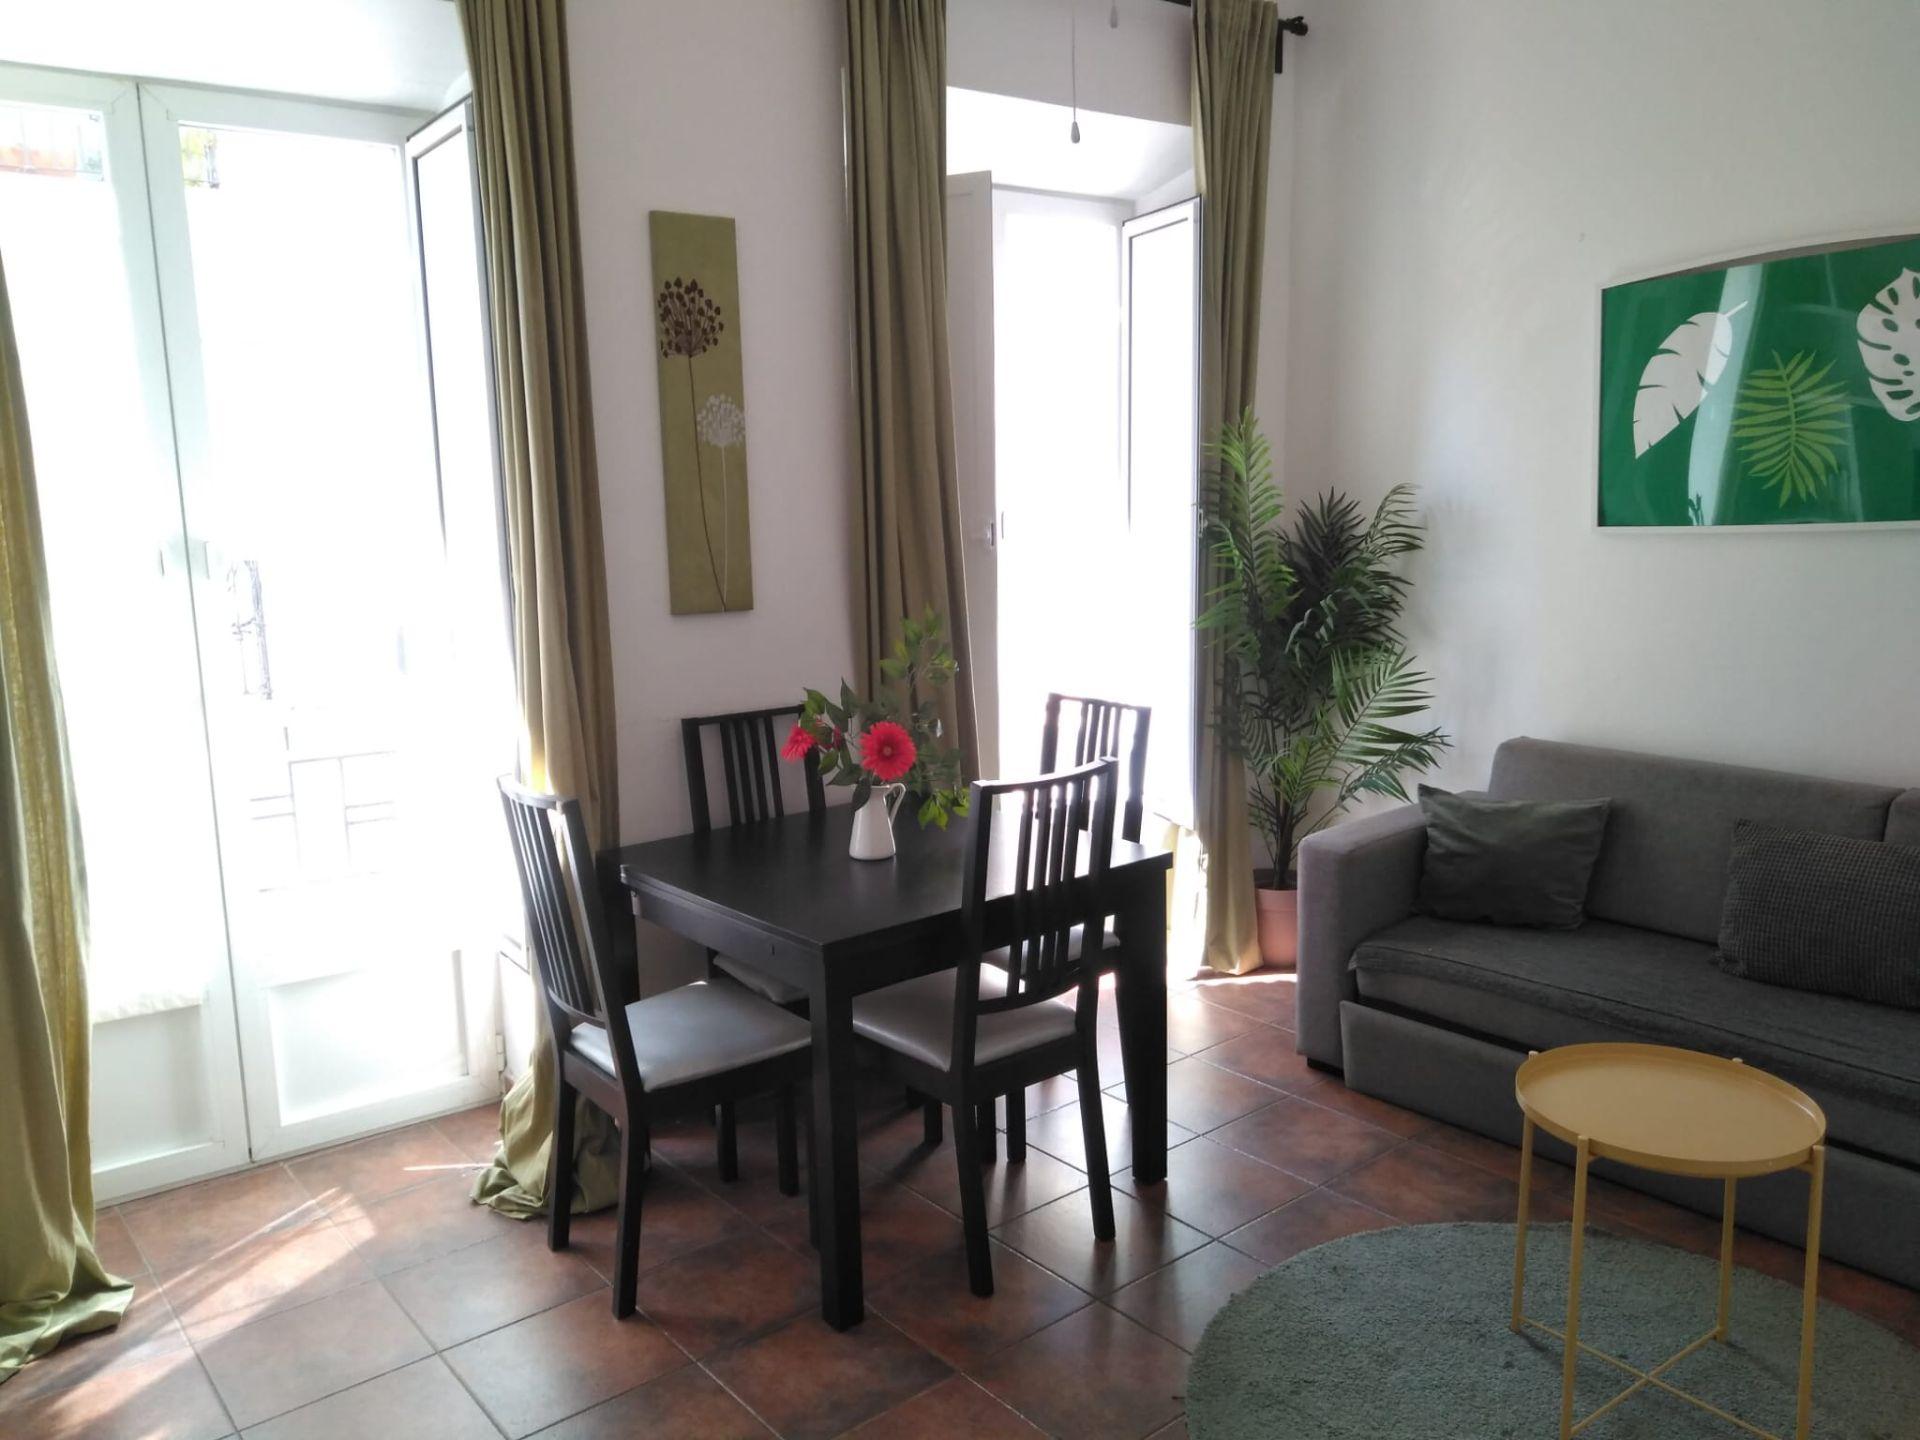 Piso en Málaga, TEATRO CERVANTES, alquiler